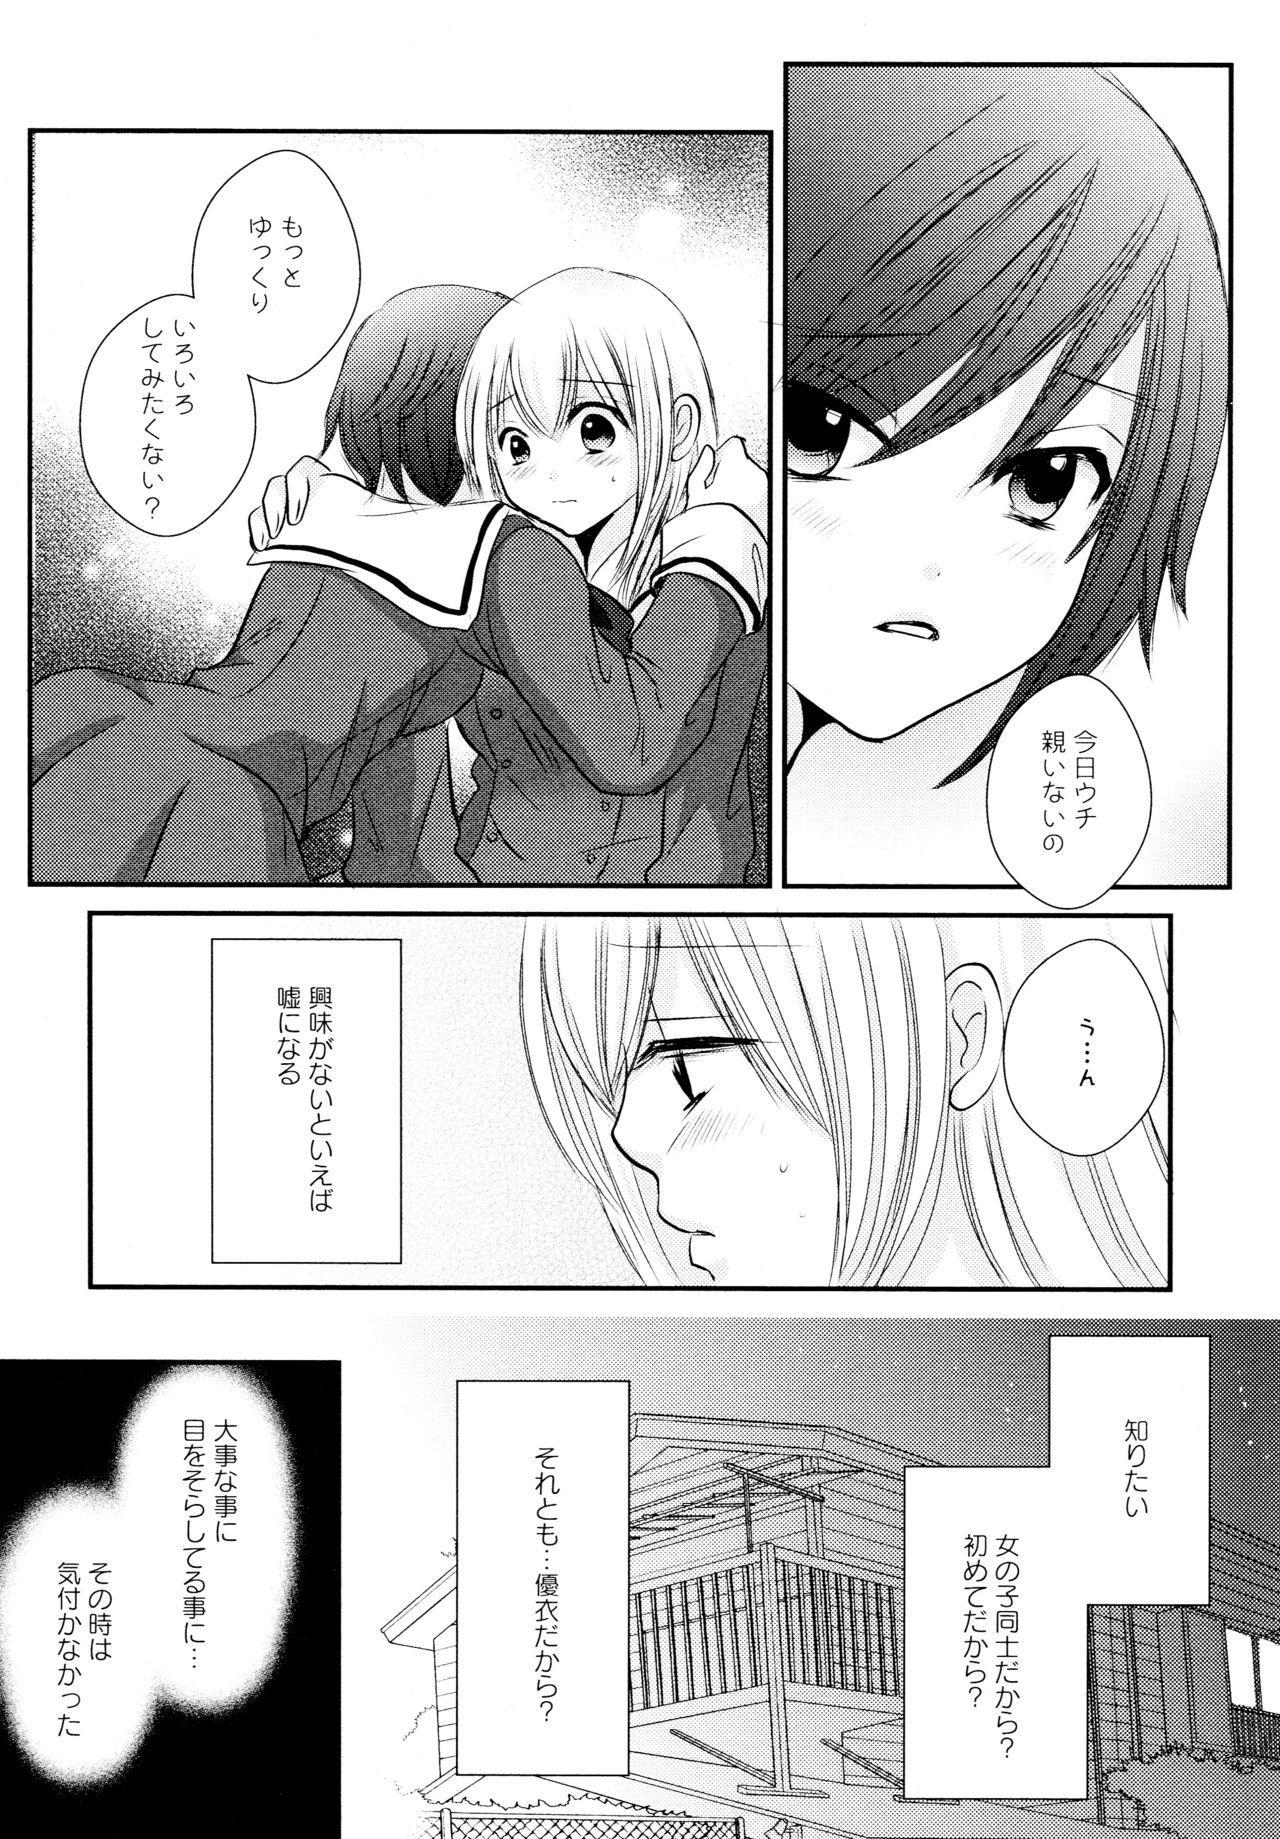 [Anthology] L Girls -Love Girls- 04 141